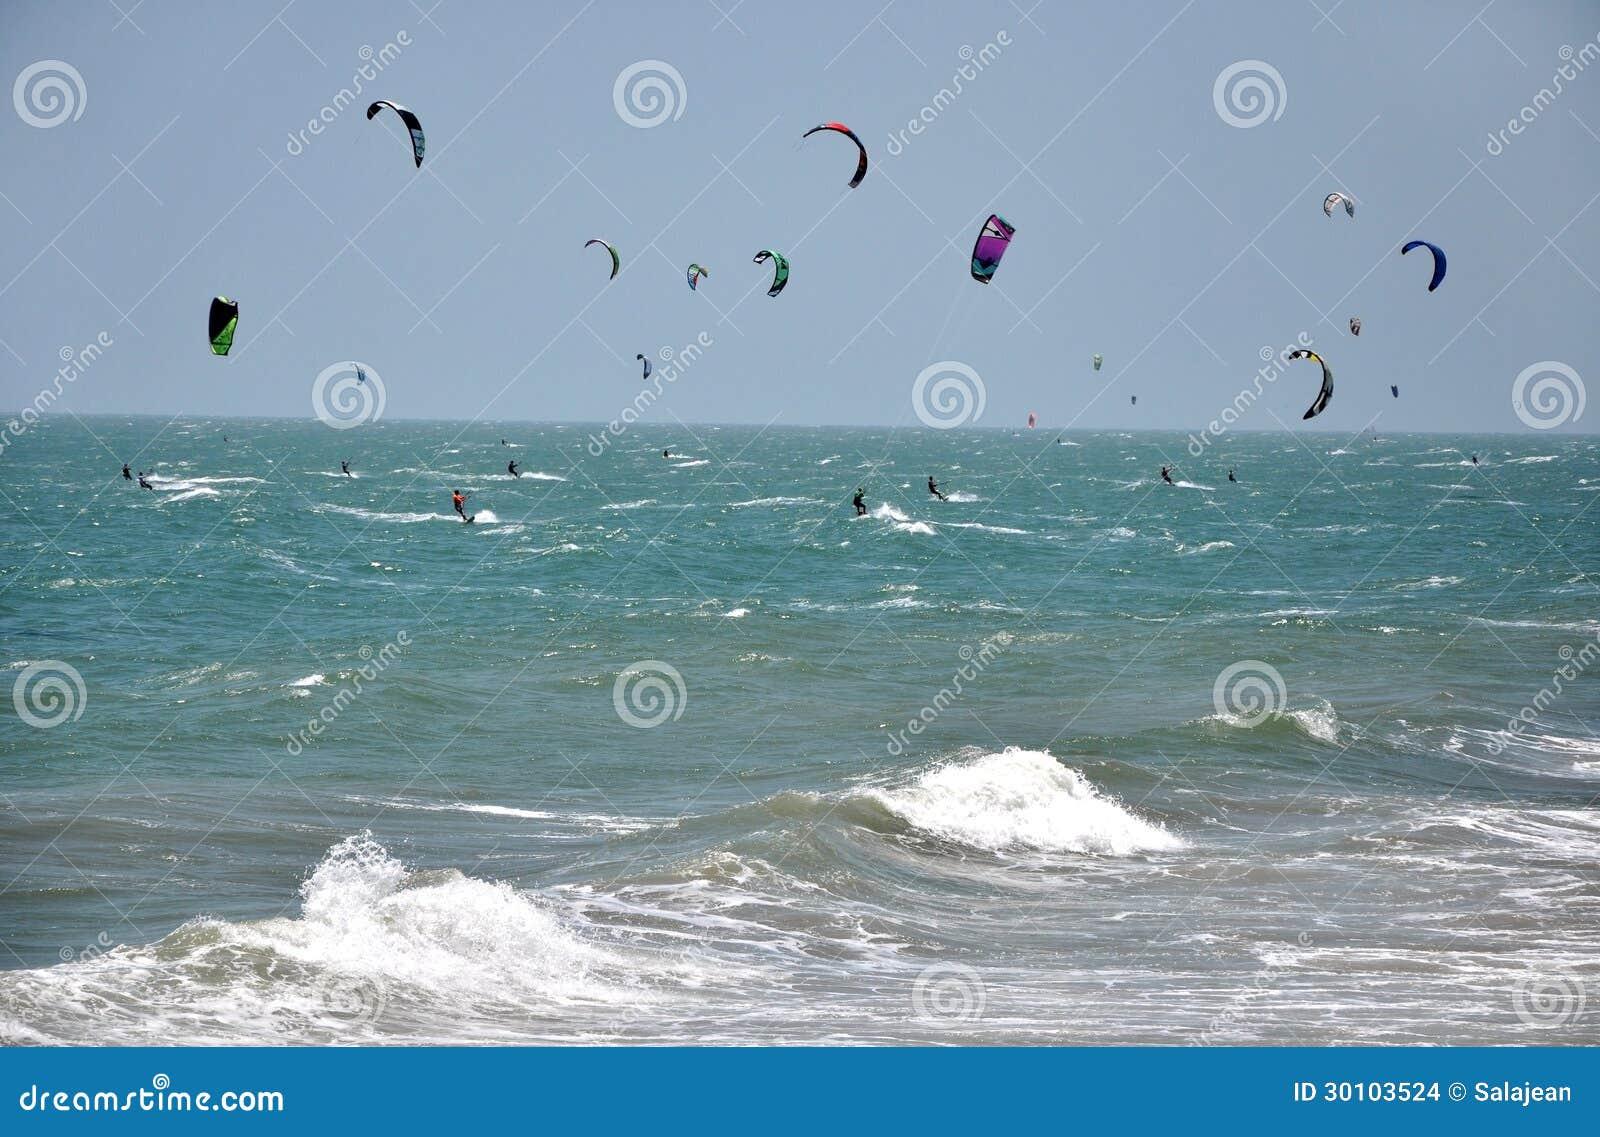 home - Kite Zone Thailand